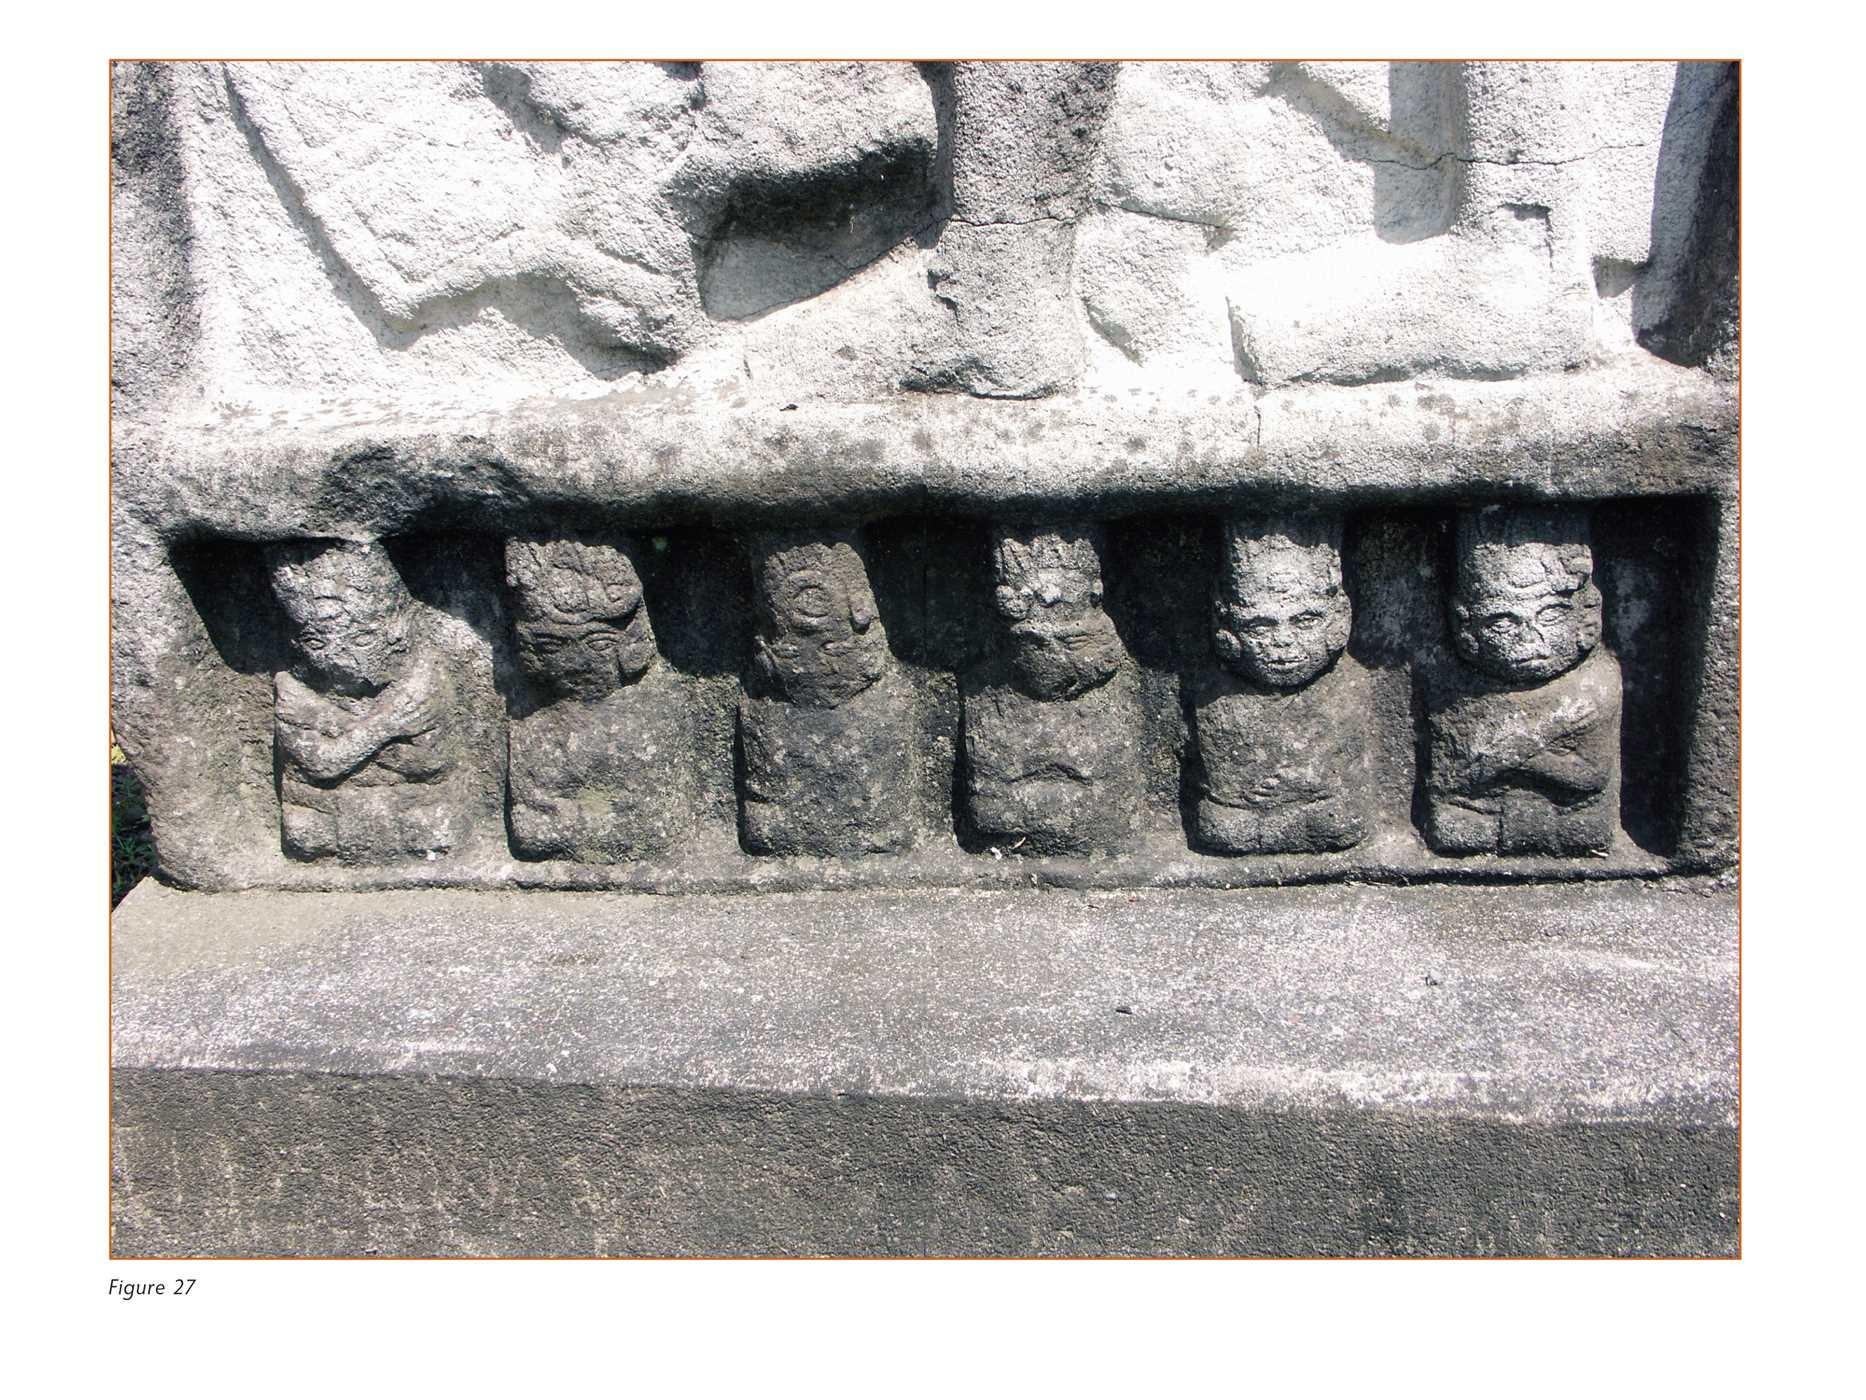 Astronaut gods of the maya 9781591432357.in06